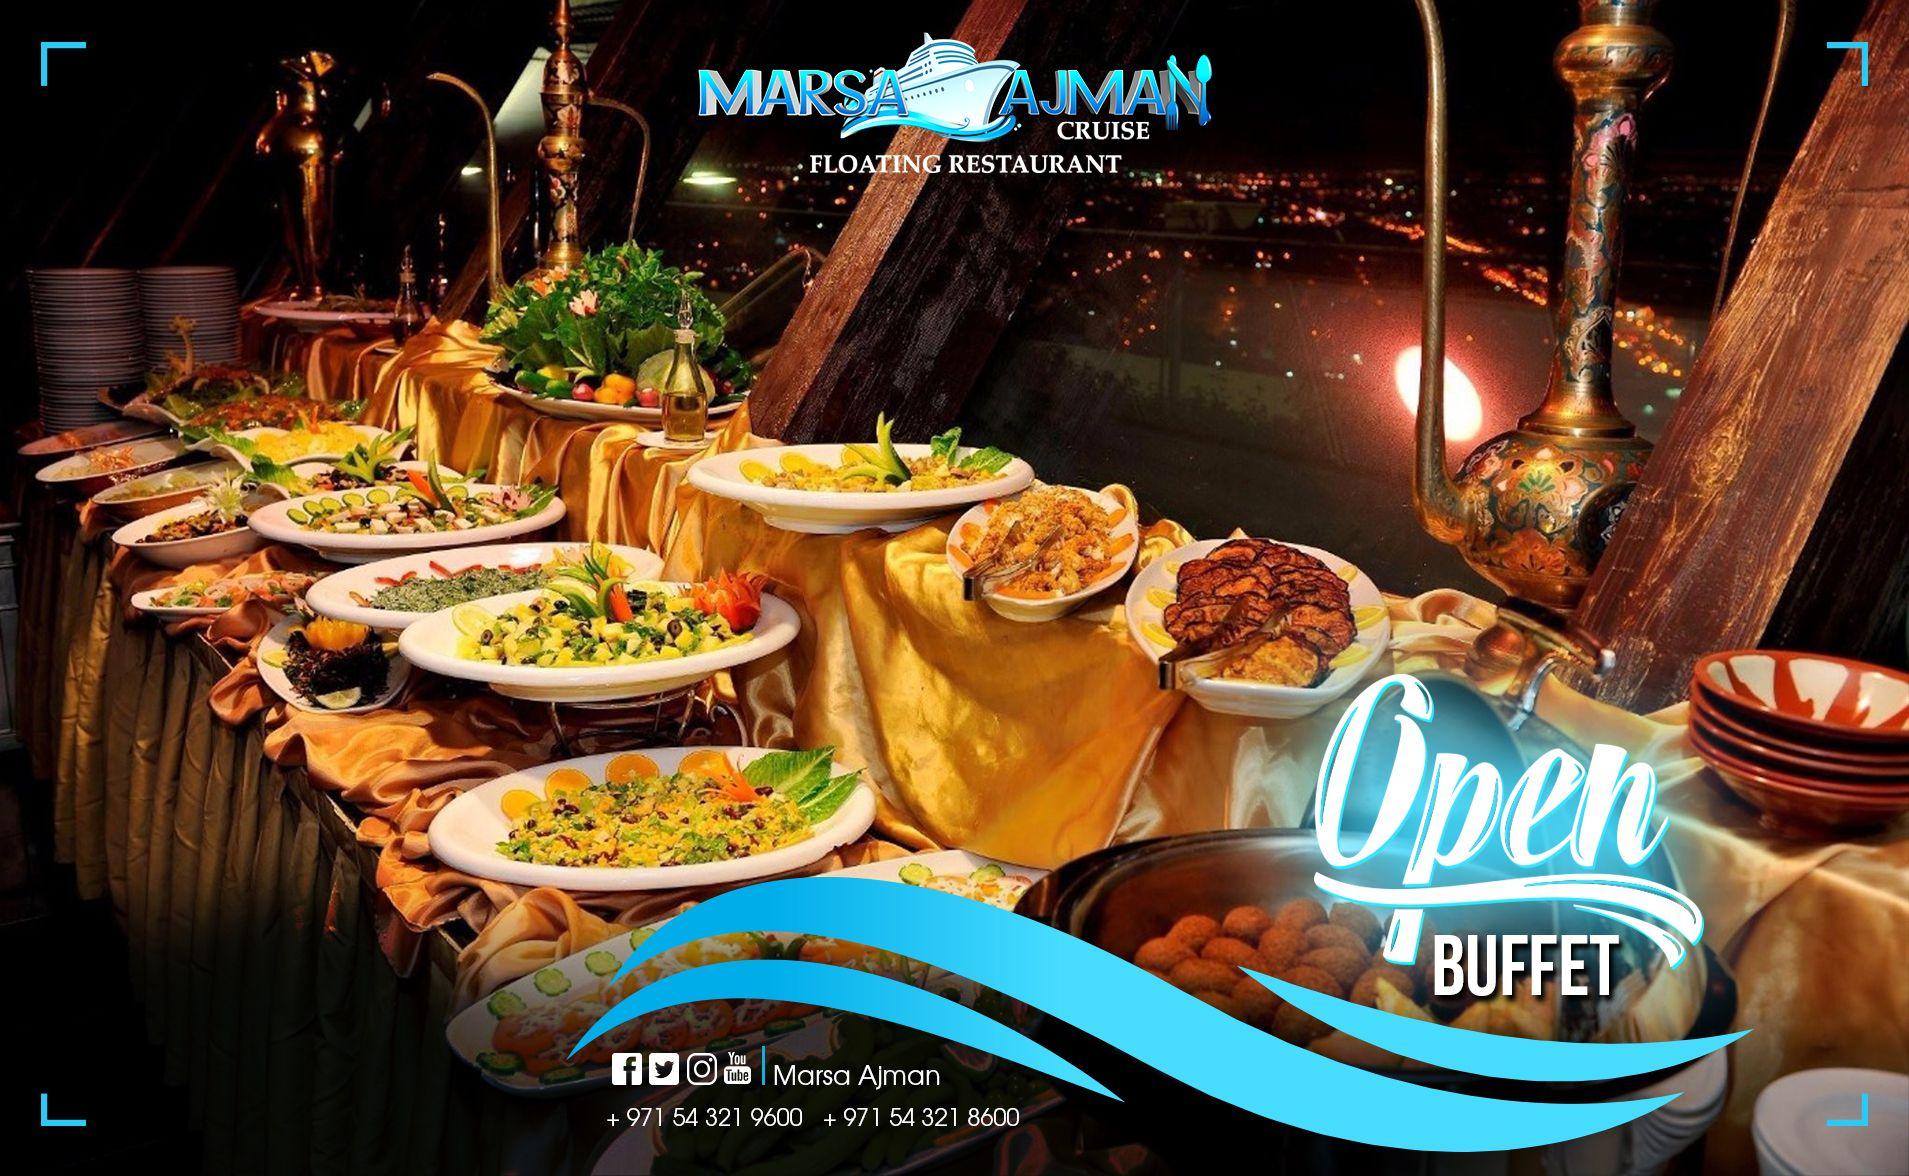 Pin By Marsaajmancruise On My Saves Floating Restaurant Open Buffet Buffet